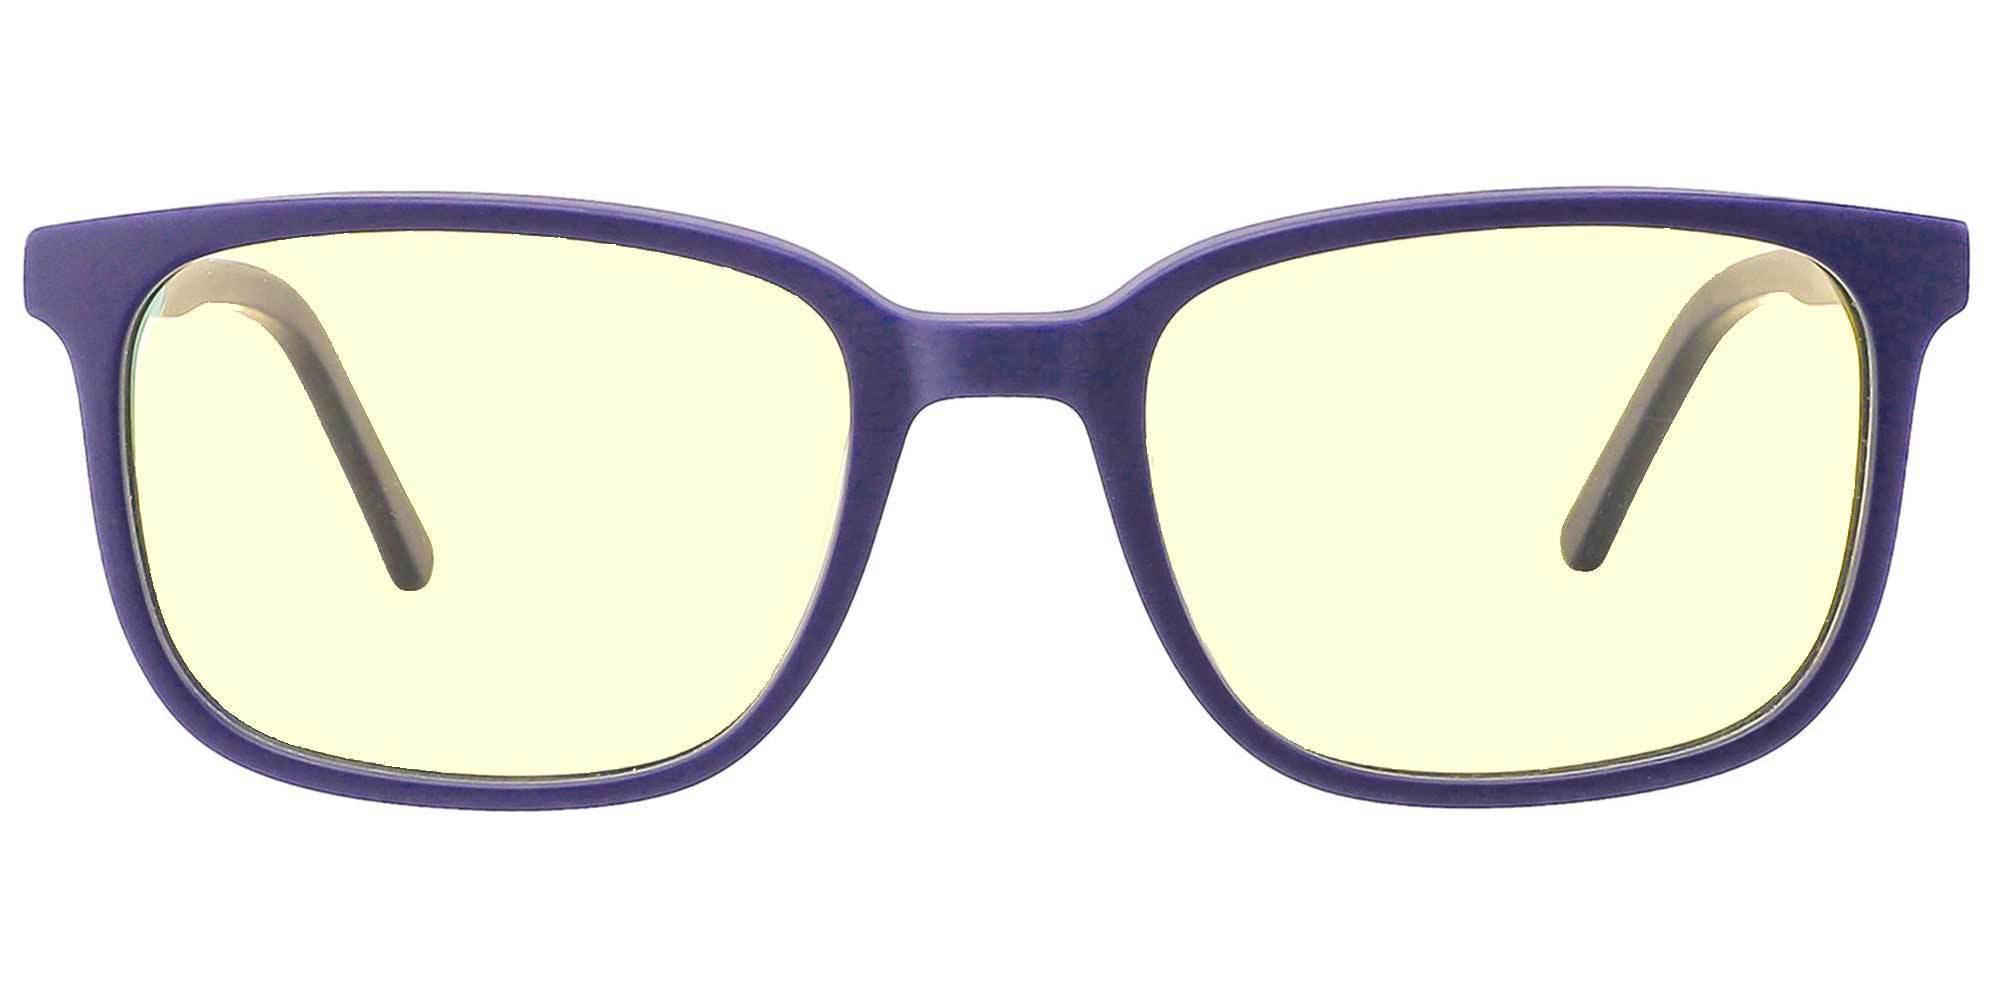 Pixel-Wear-meru-amber-glasses-matte-navy-front-Gift-Guide